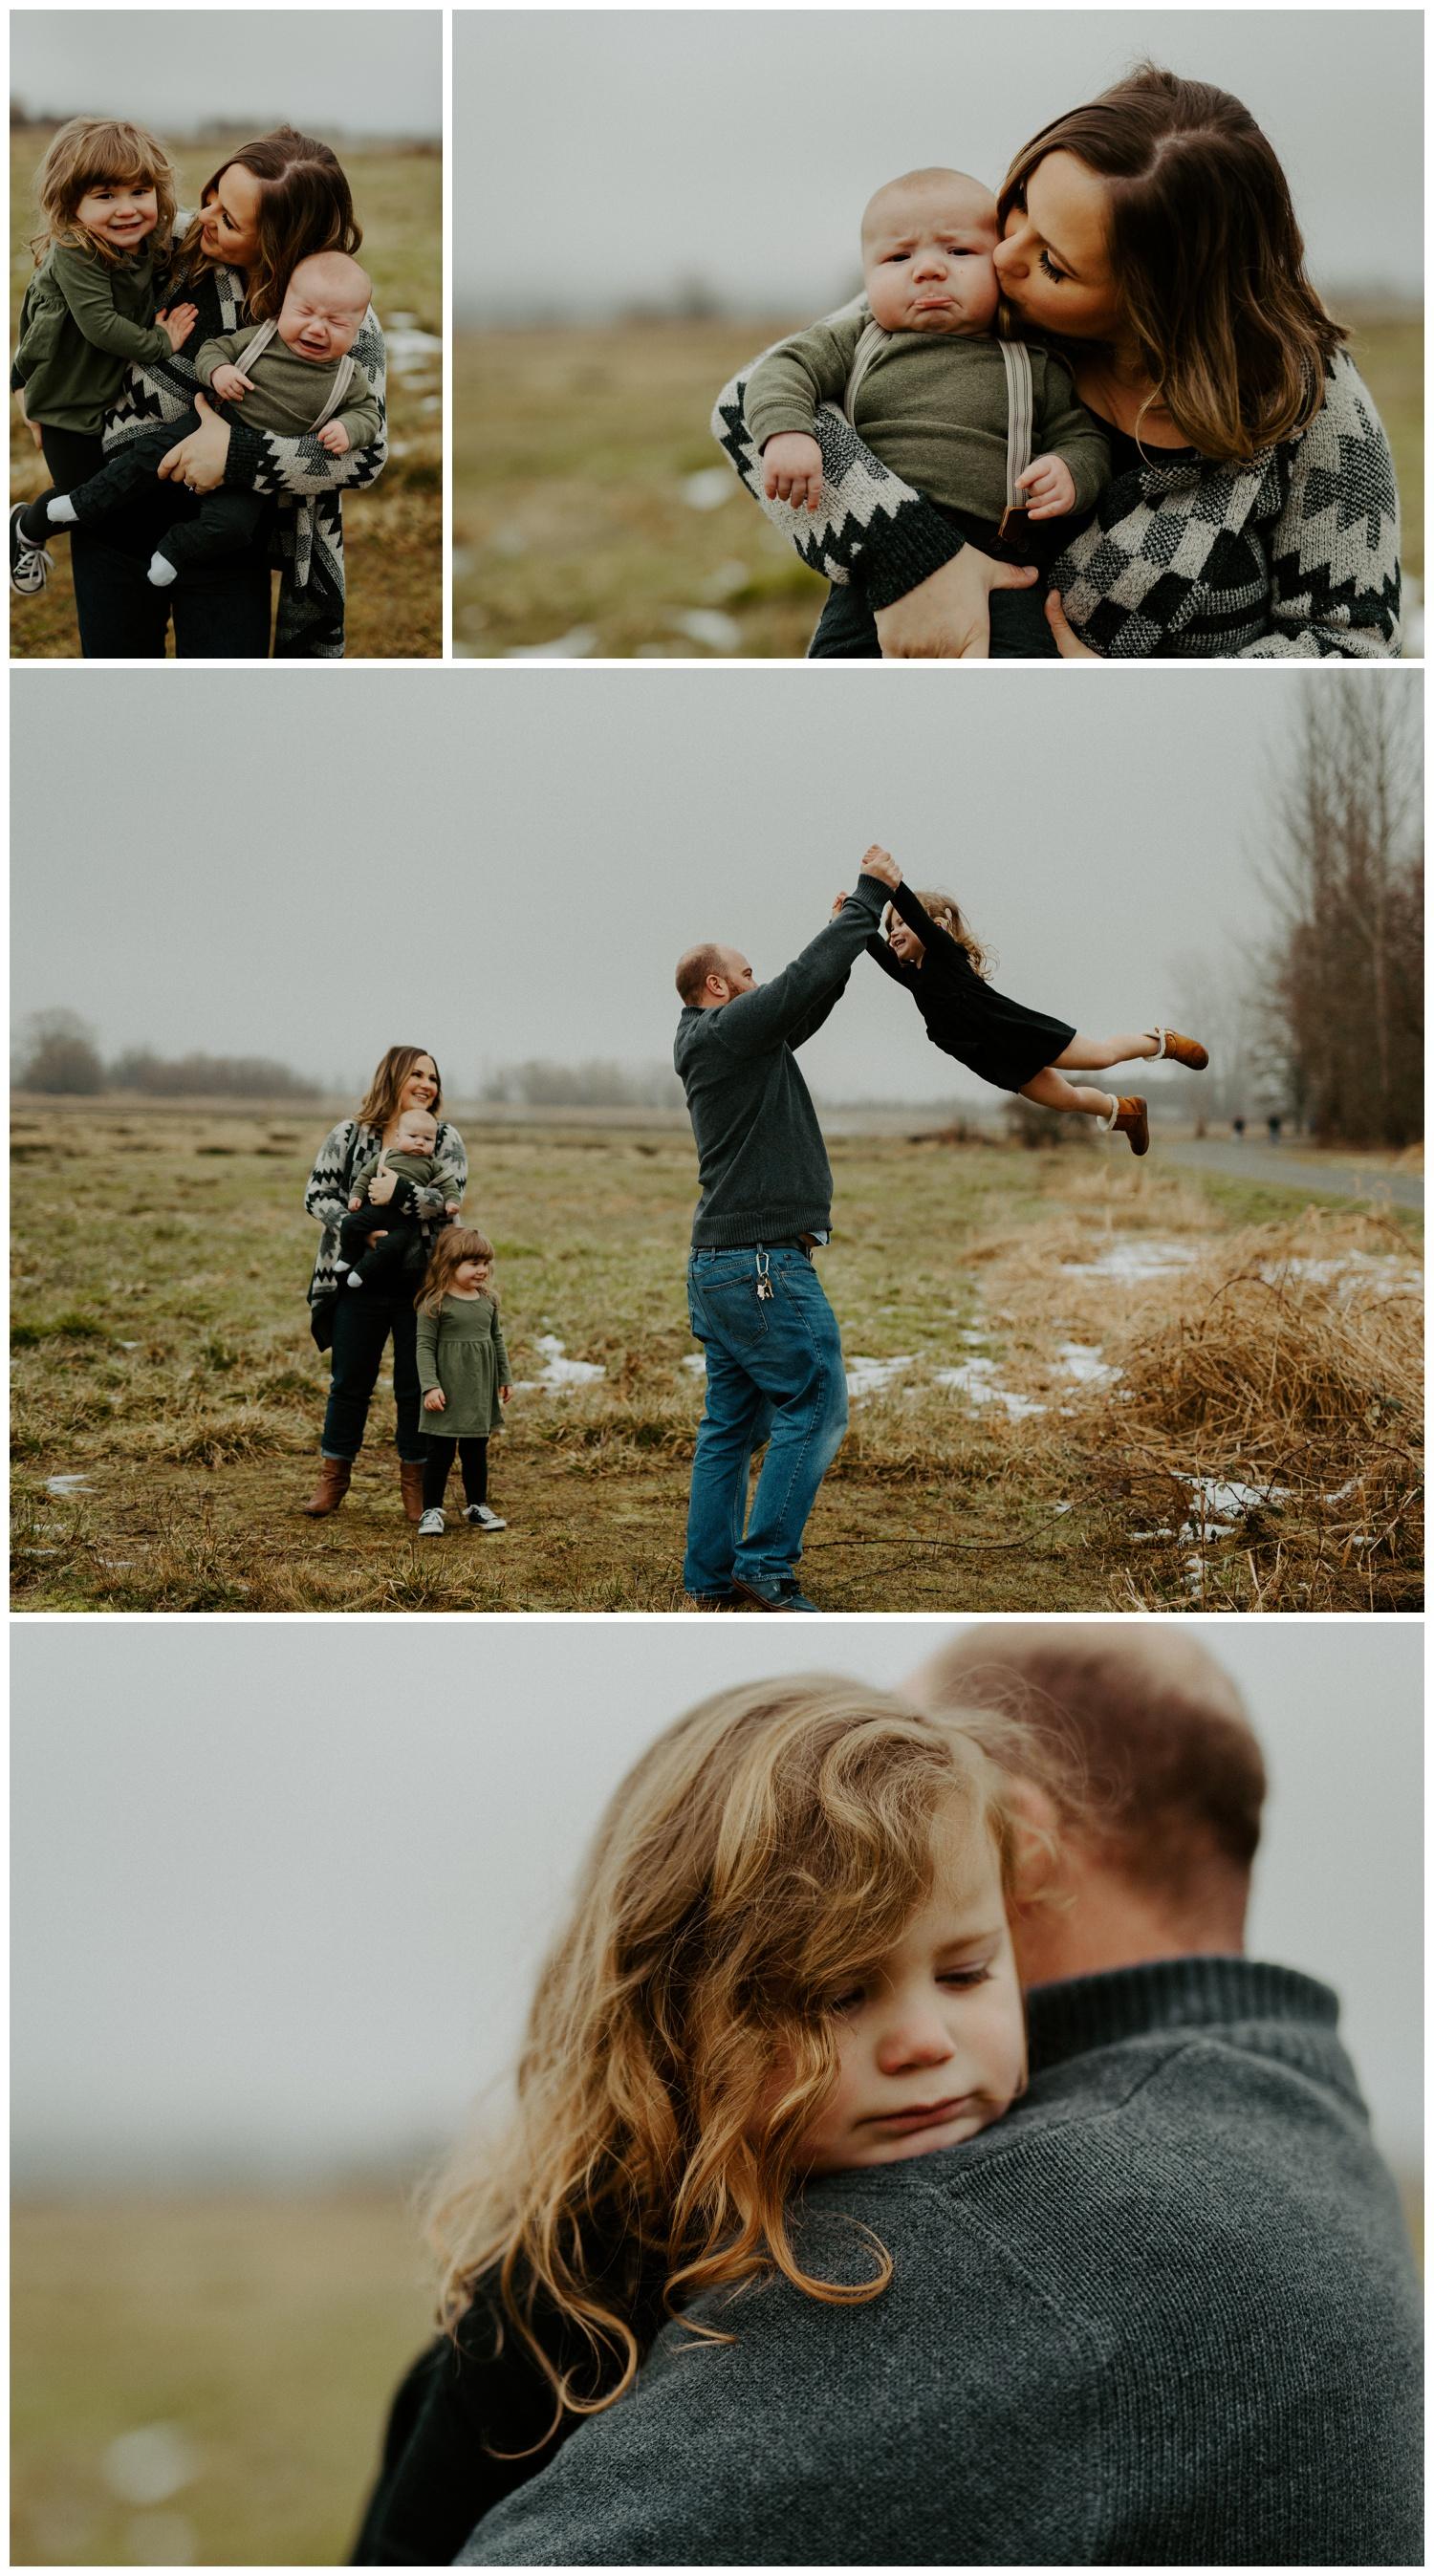 Olympia Washington Family photos in a foggy field | Jessica Heron Images | jessicaheronimages.com 006.JPG